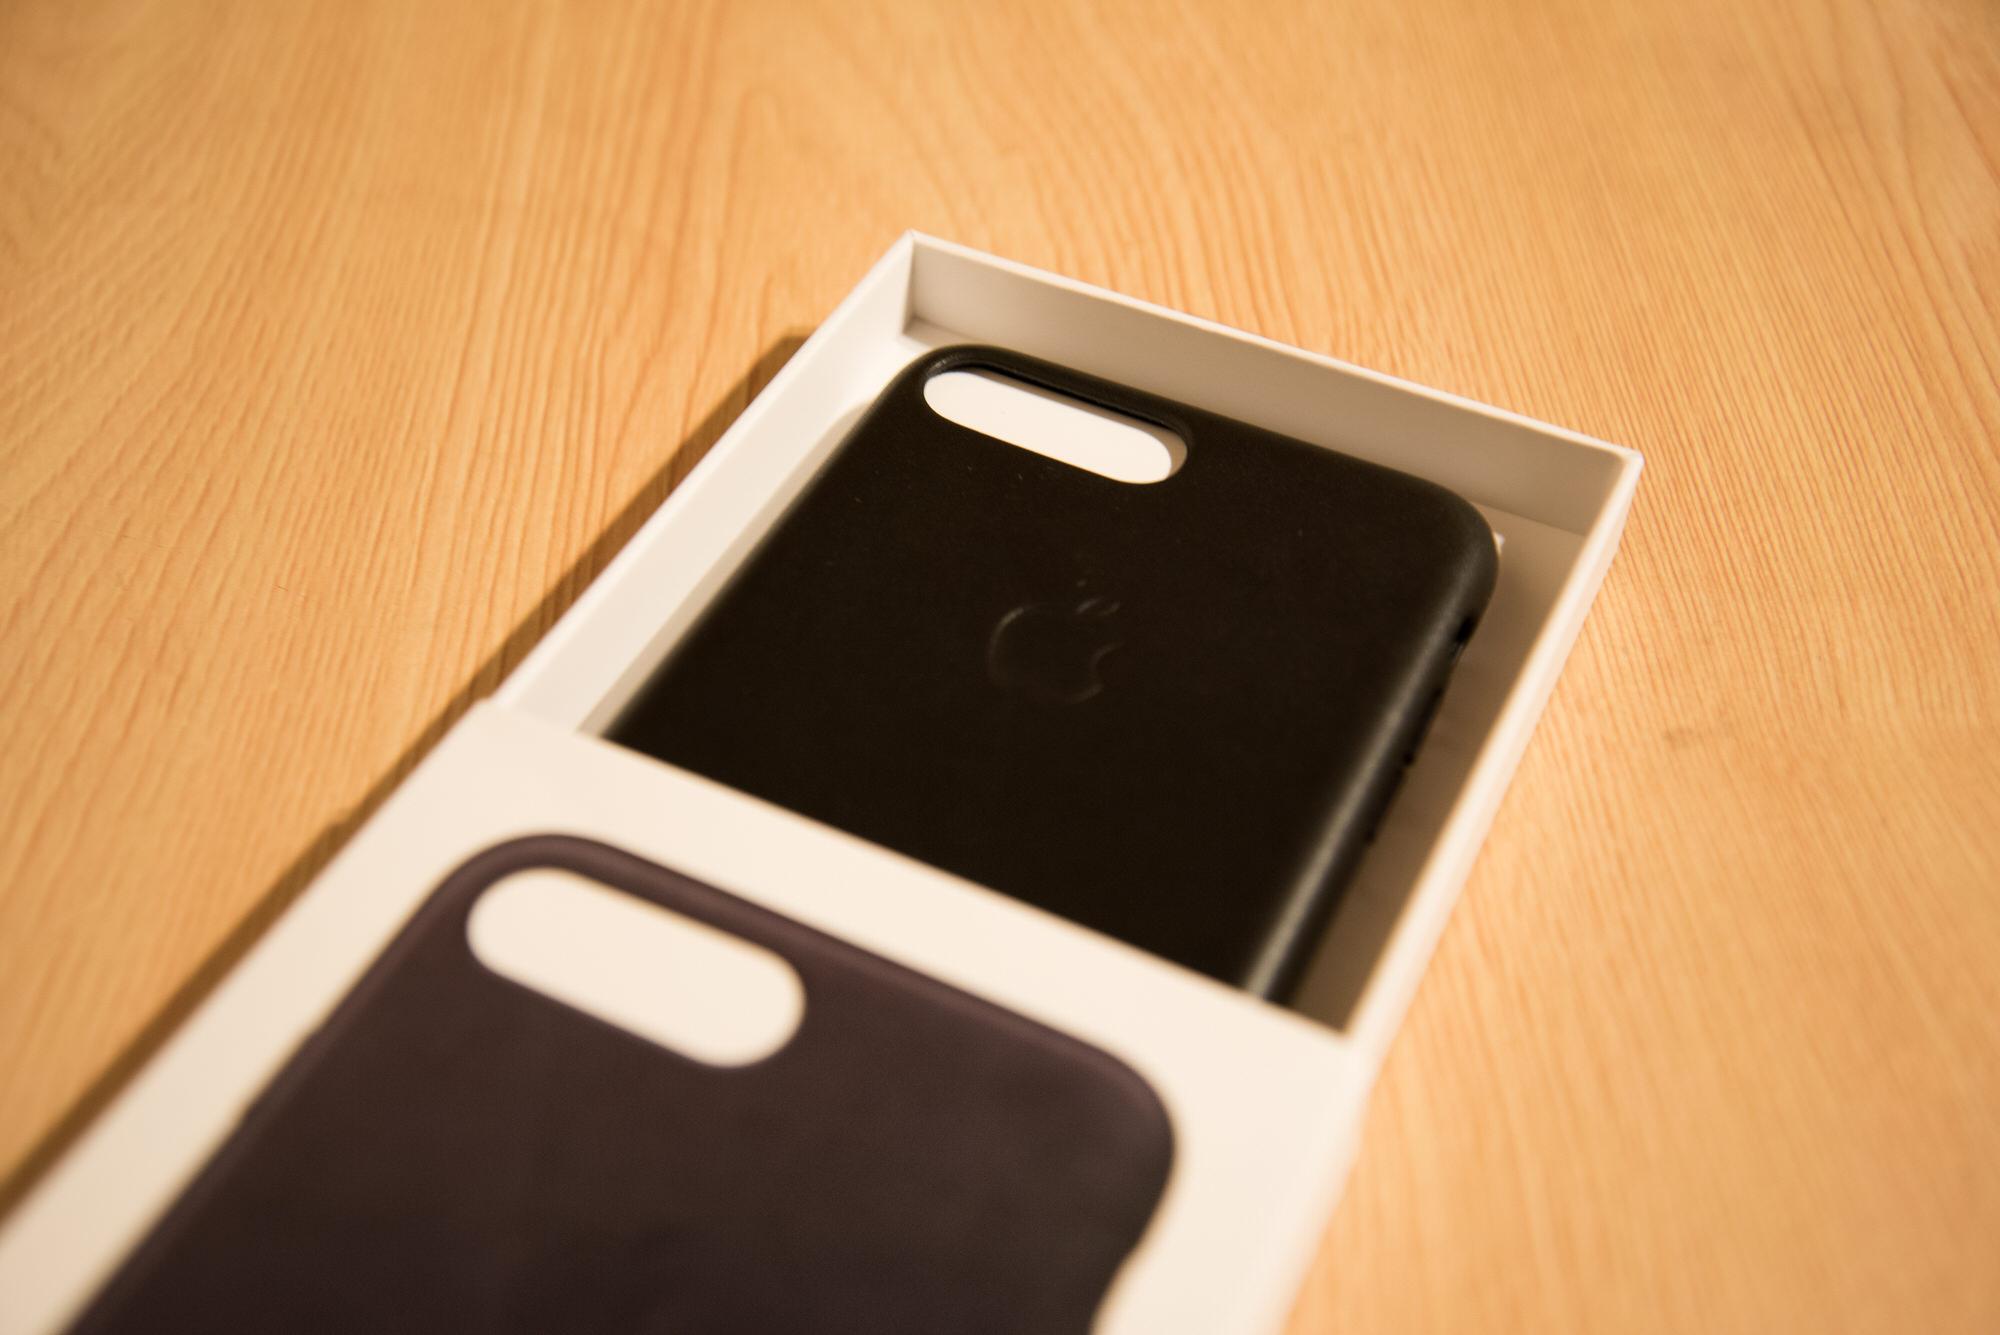 Iphone7plus leathercase 2